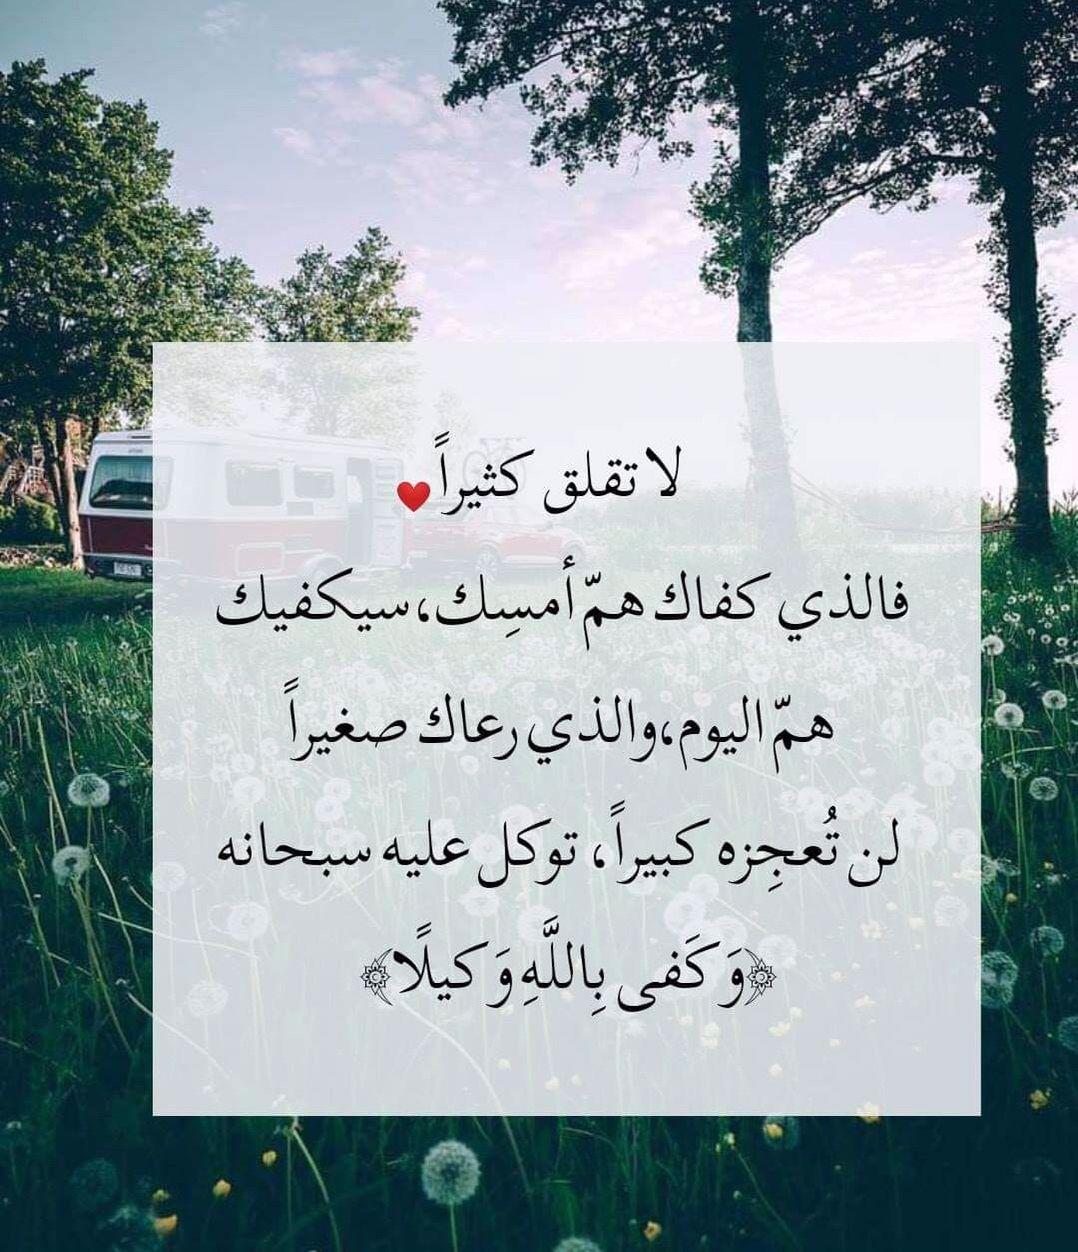 Pin By 1122334455 On مواعظ خواطر إسلامية Islamic Phrases Islamic Quotes Islam Quran